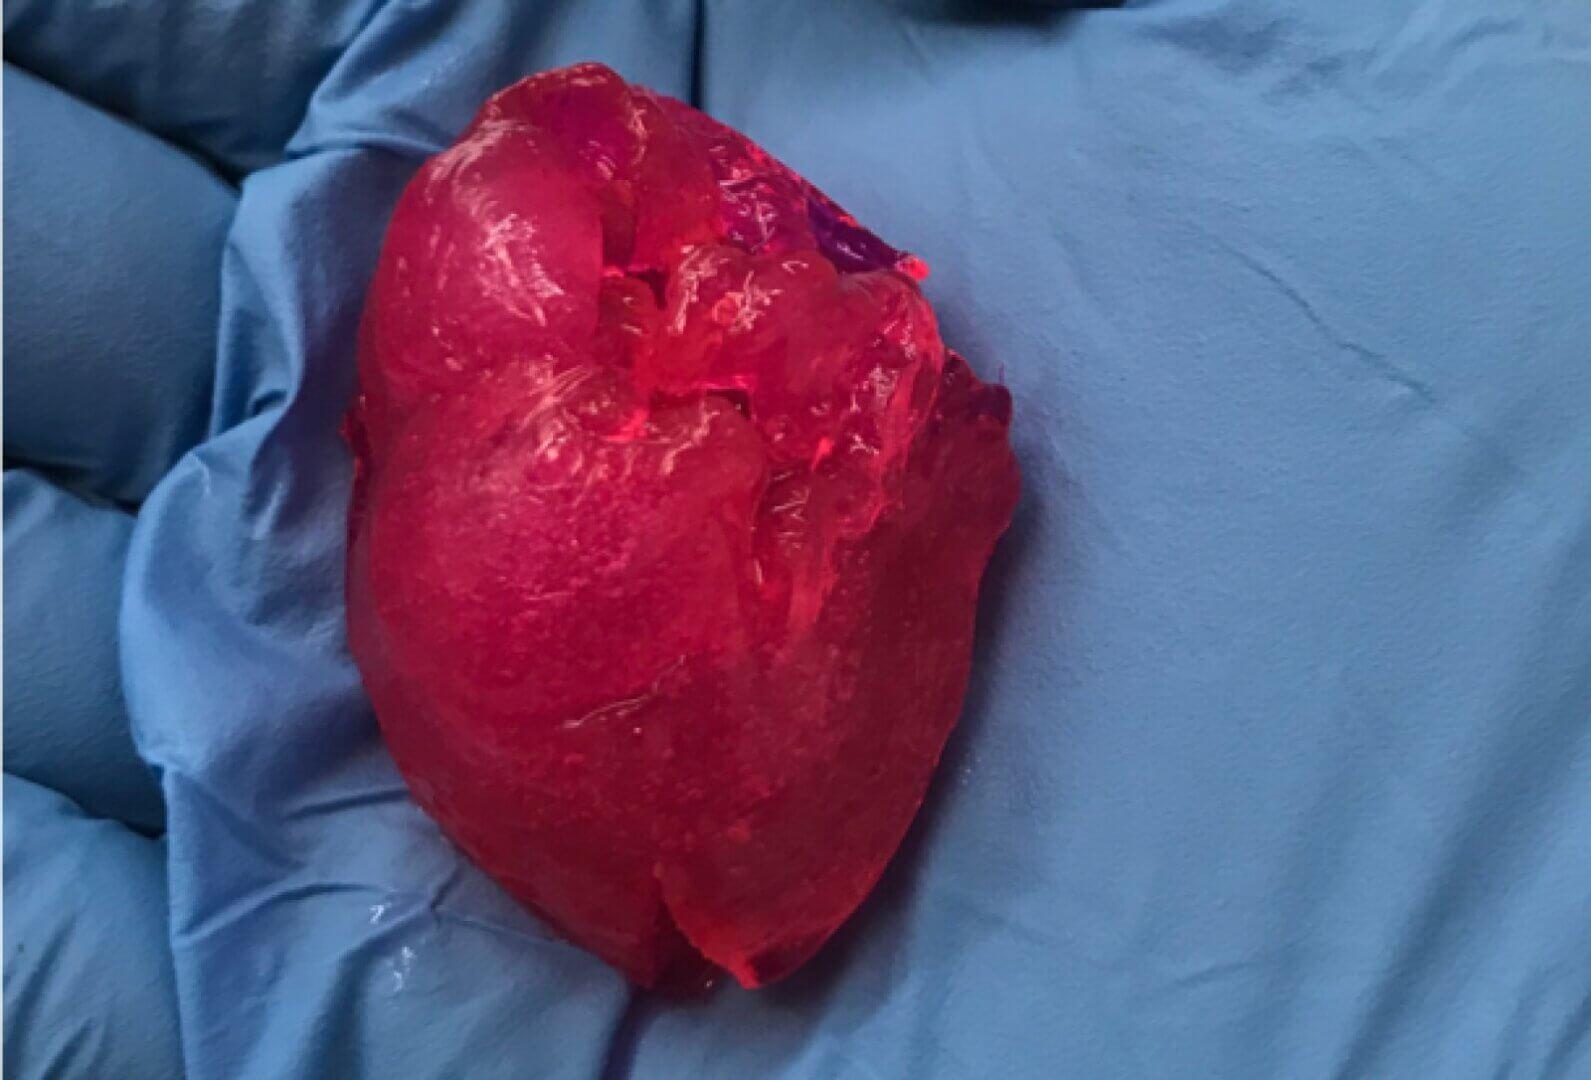 В Чикаго напечатали на 3D-принтере мини-сердце